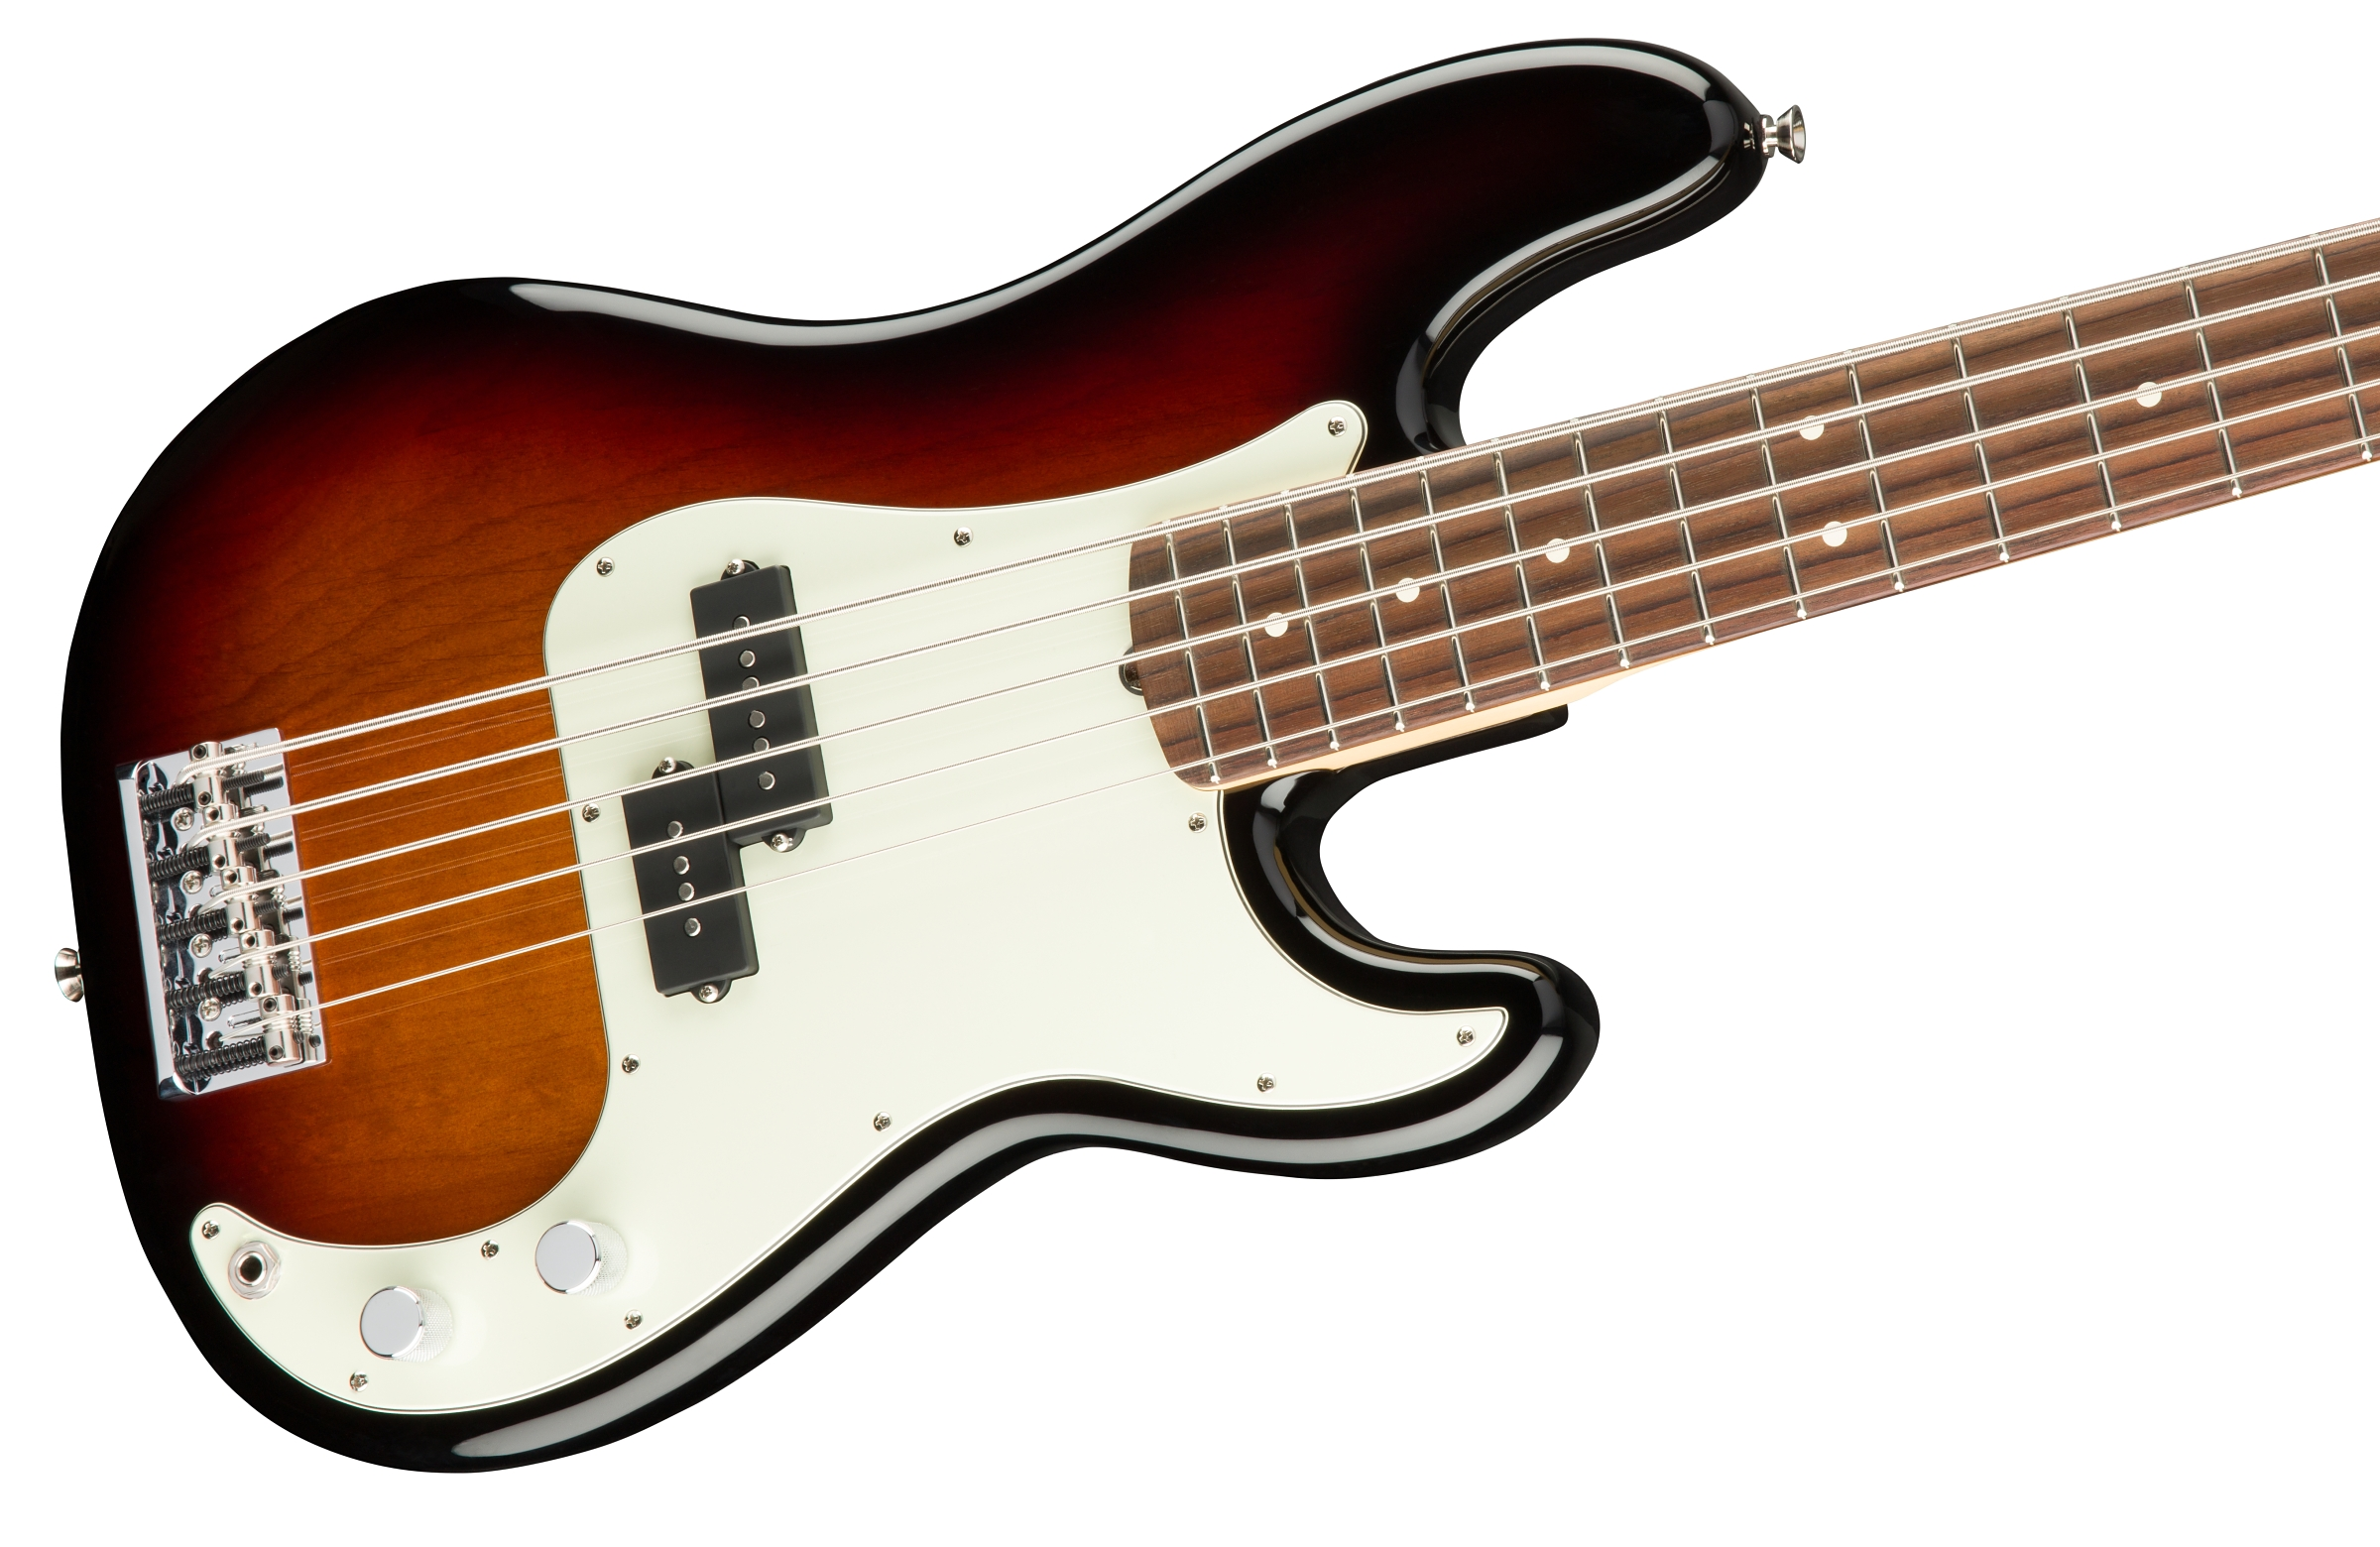 american professional precision bass v electric basses. Black Bedroom Furniture Sets. Home Design Ideas